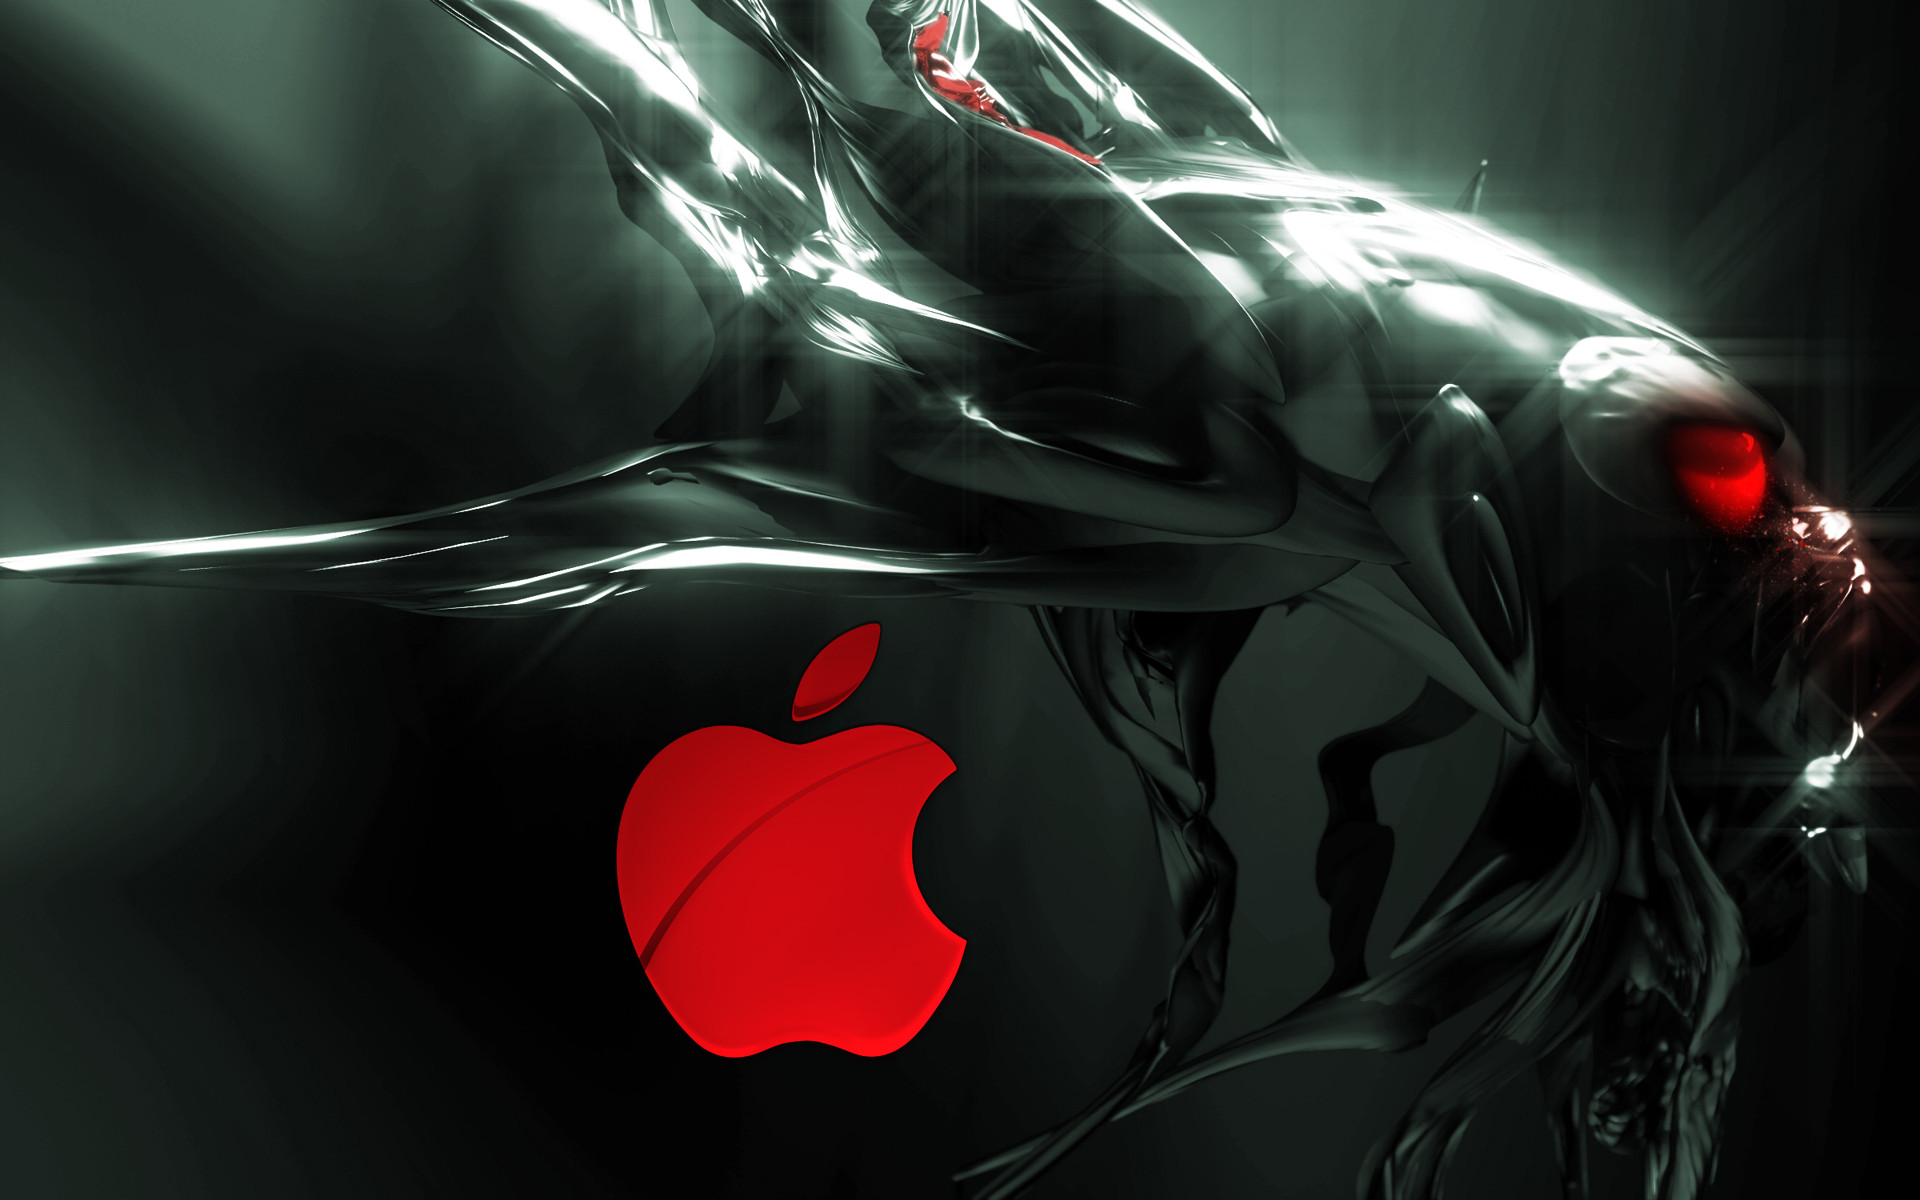 Res: 1920x1200, ... Apple HD Wallpapers in Best  px Resolutions   Kizzy Murrieta  GLaureL Pack IV ...